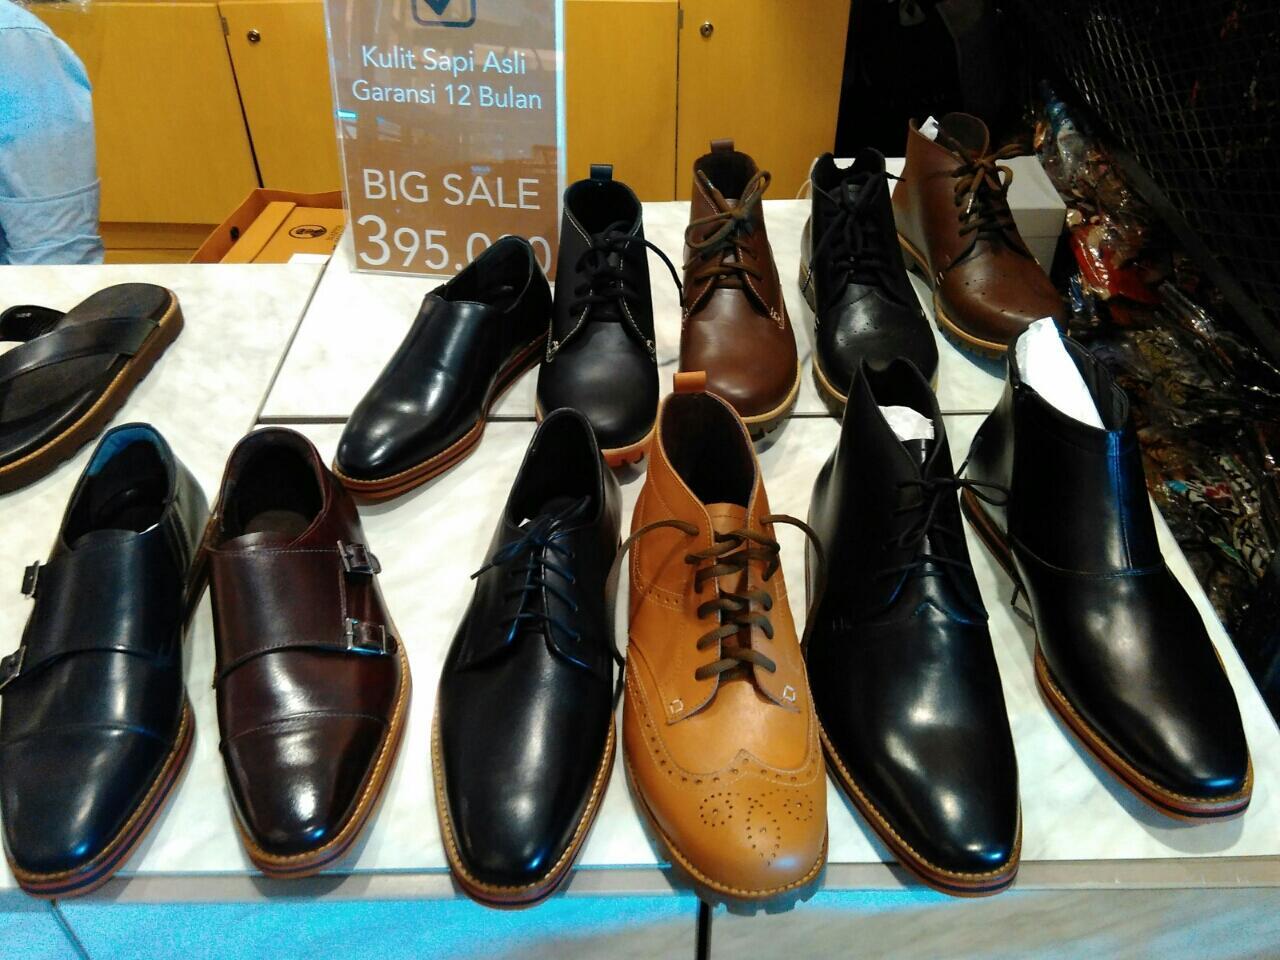 Harga Giant Shoes Longwing Brown Sepatu Formal Pria Terbaru 2018 Toods Footwear All About Dress Shoe Page 71 Kaskus